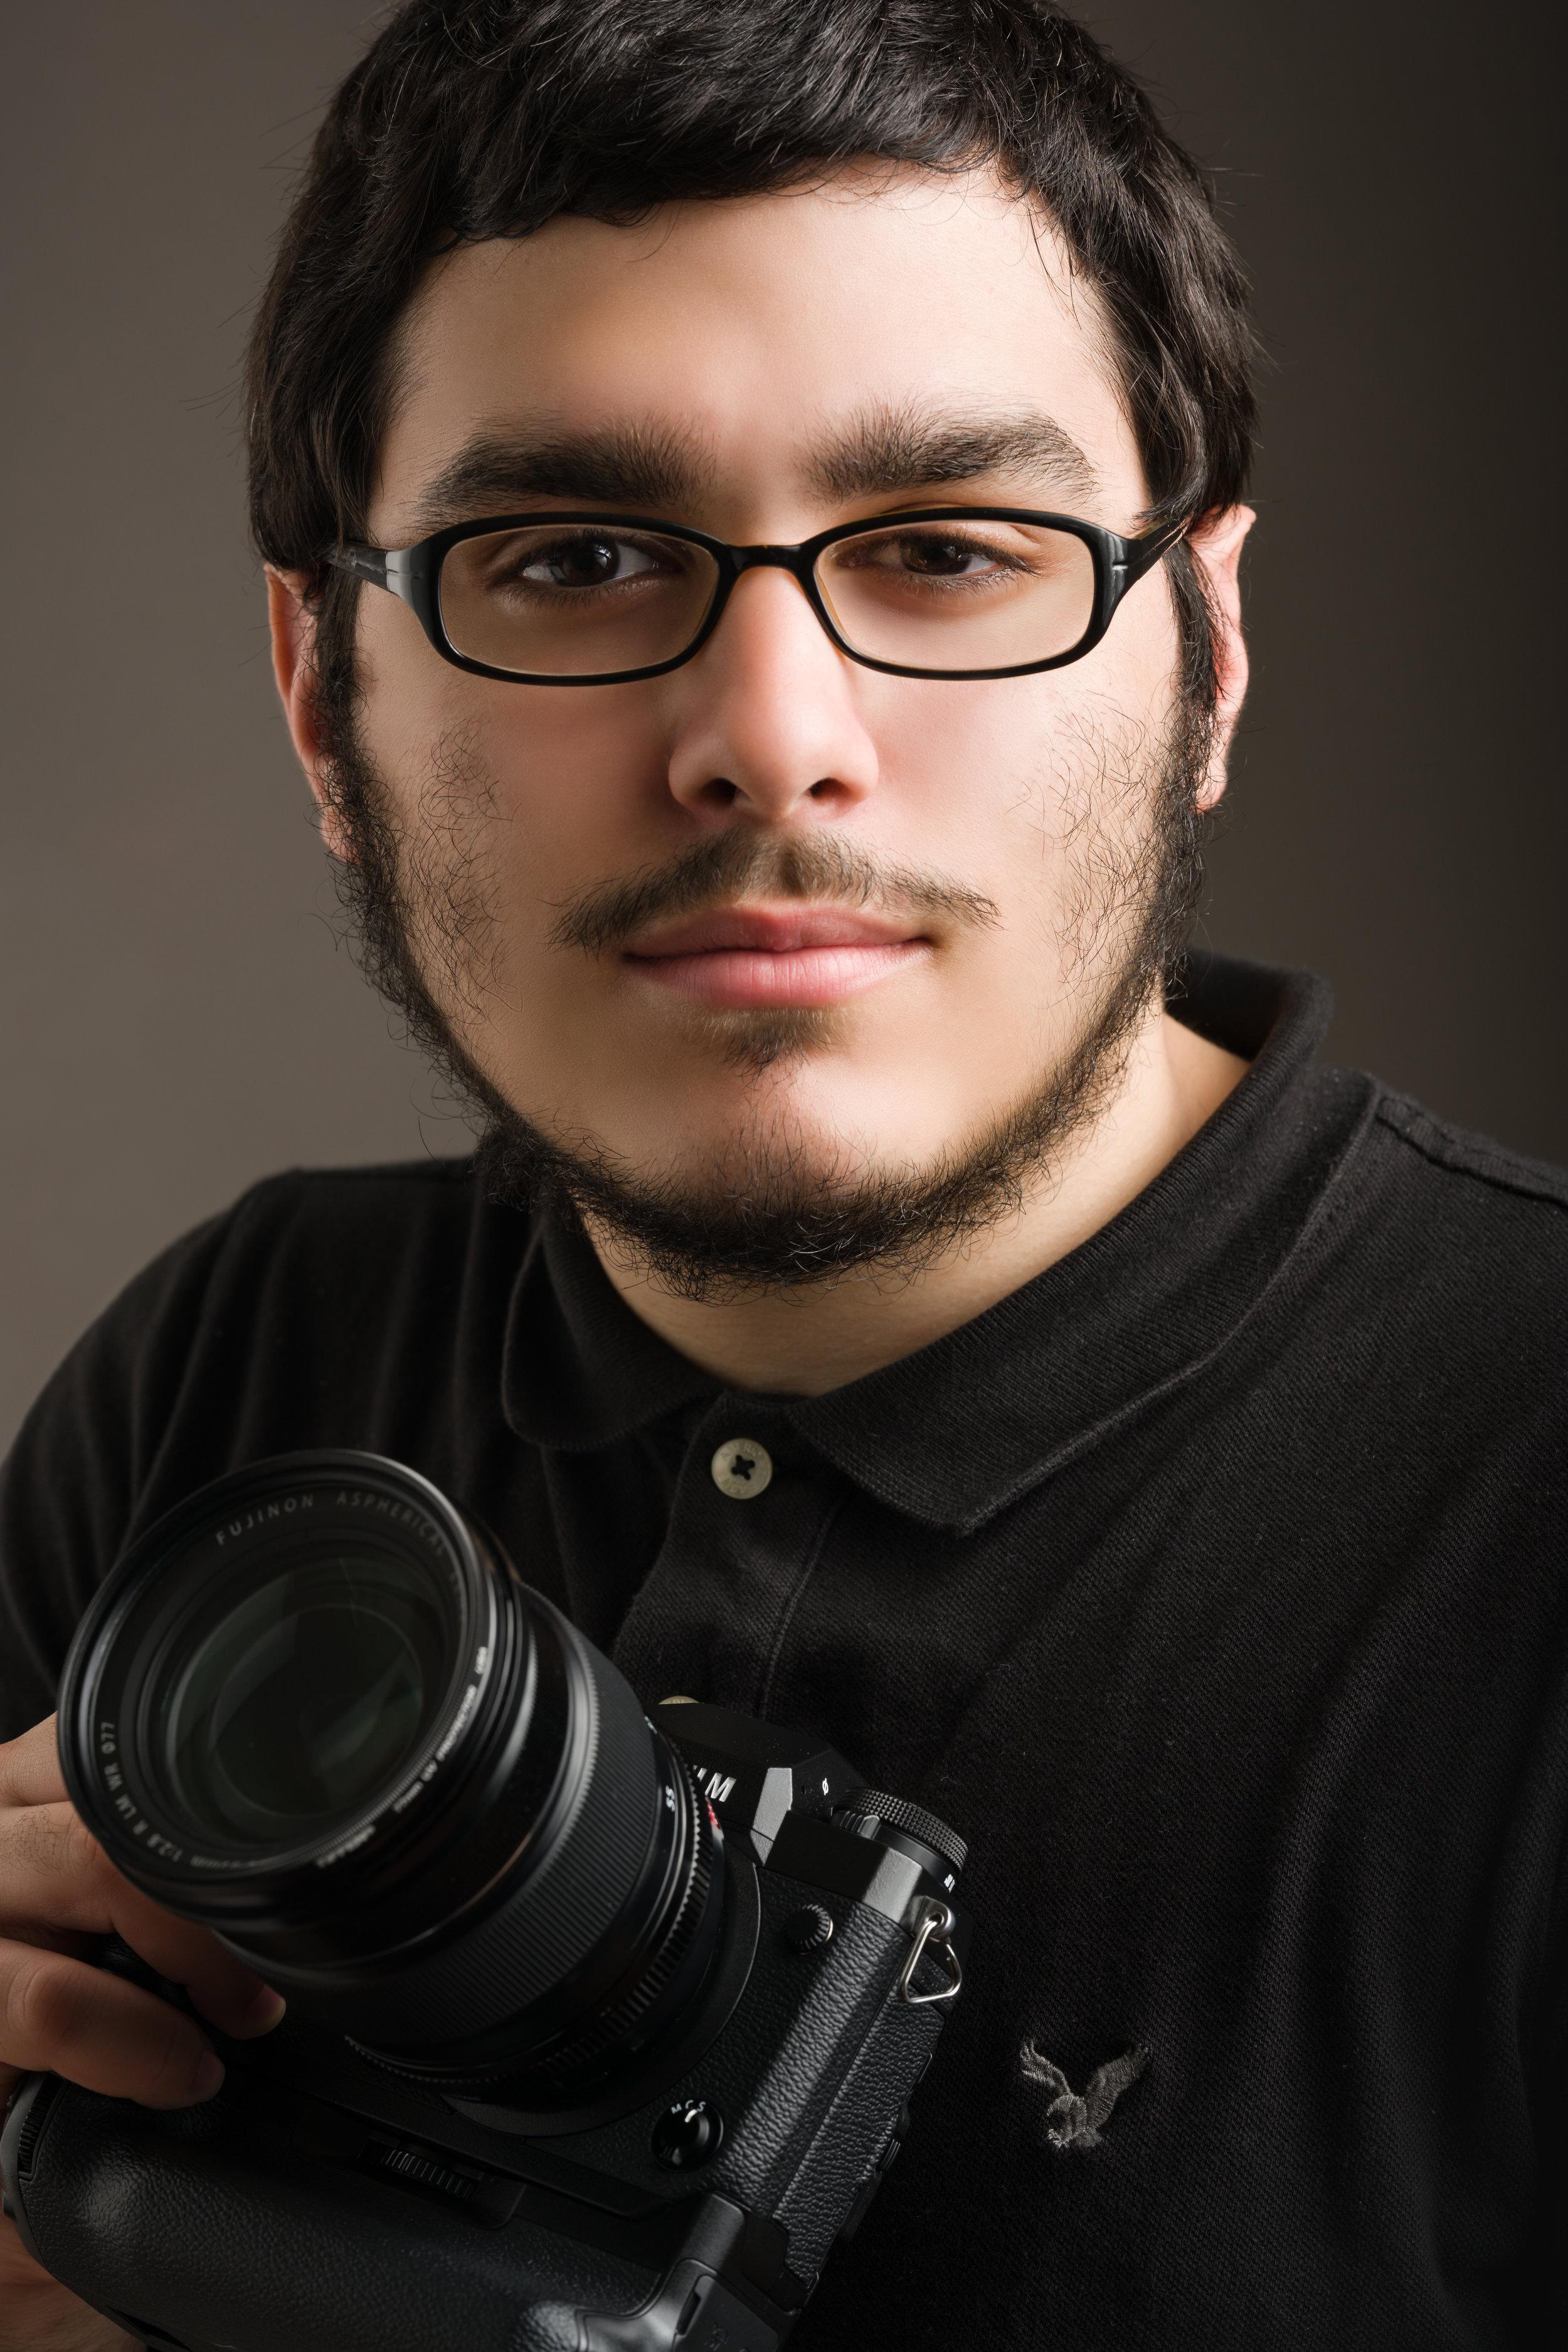 David Goris, Occupational Portrait